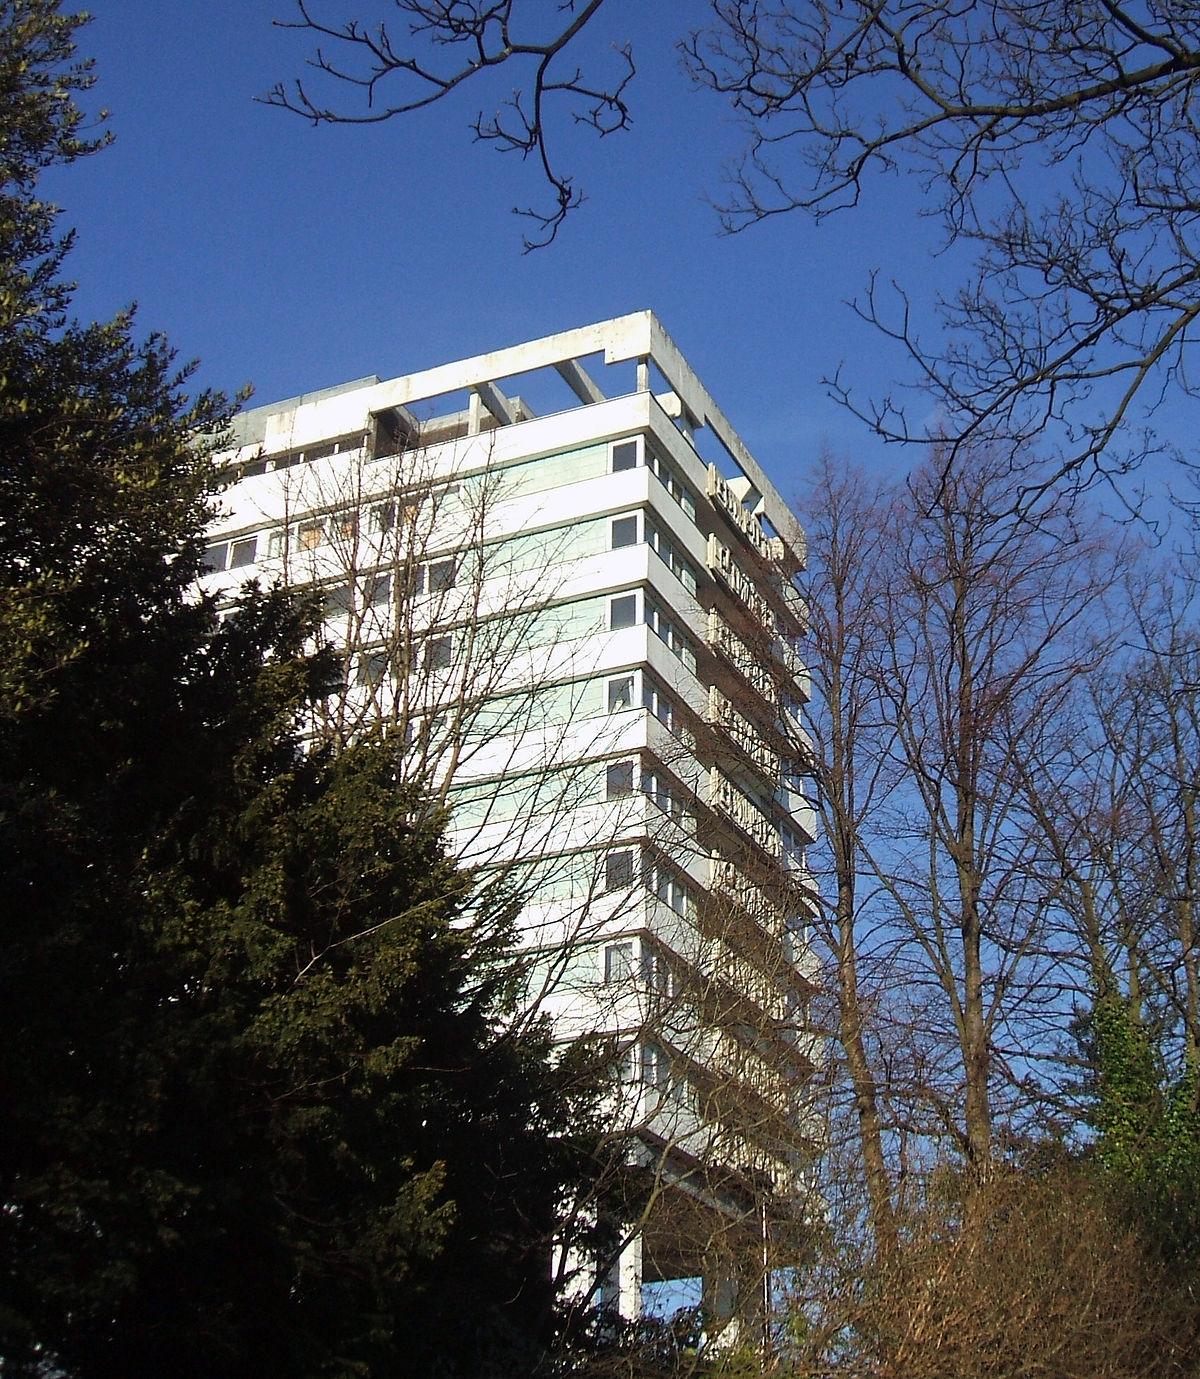 Hallam Tower Wikipedia